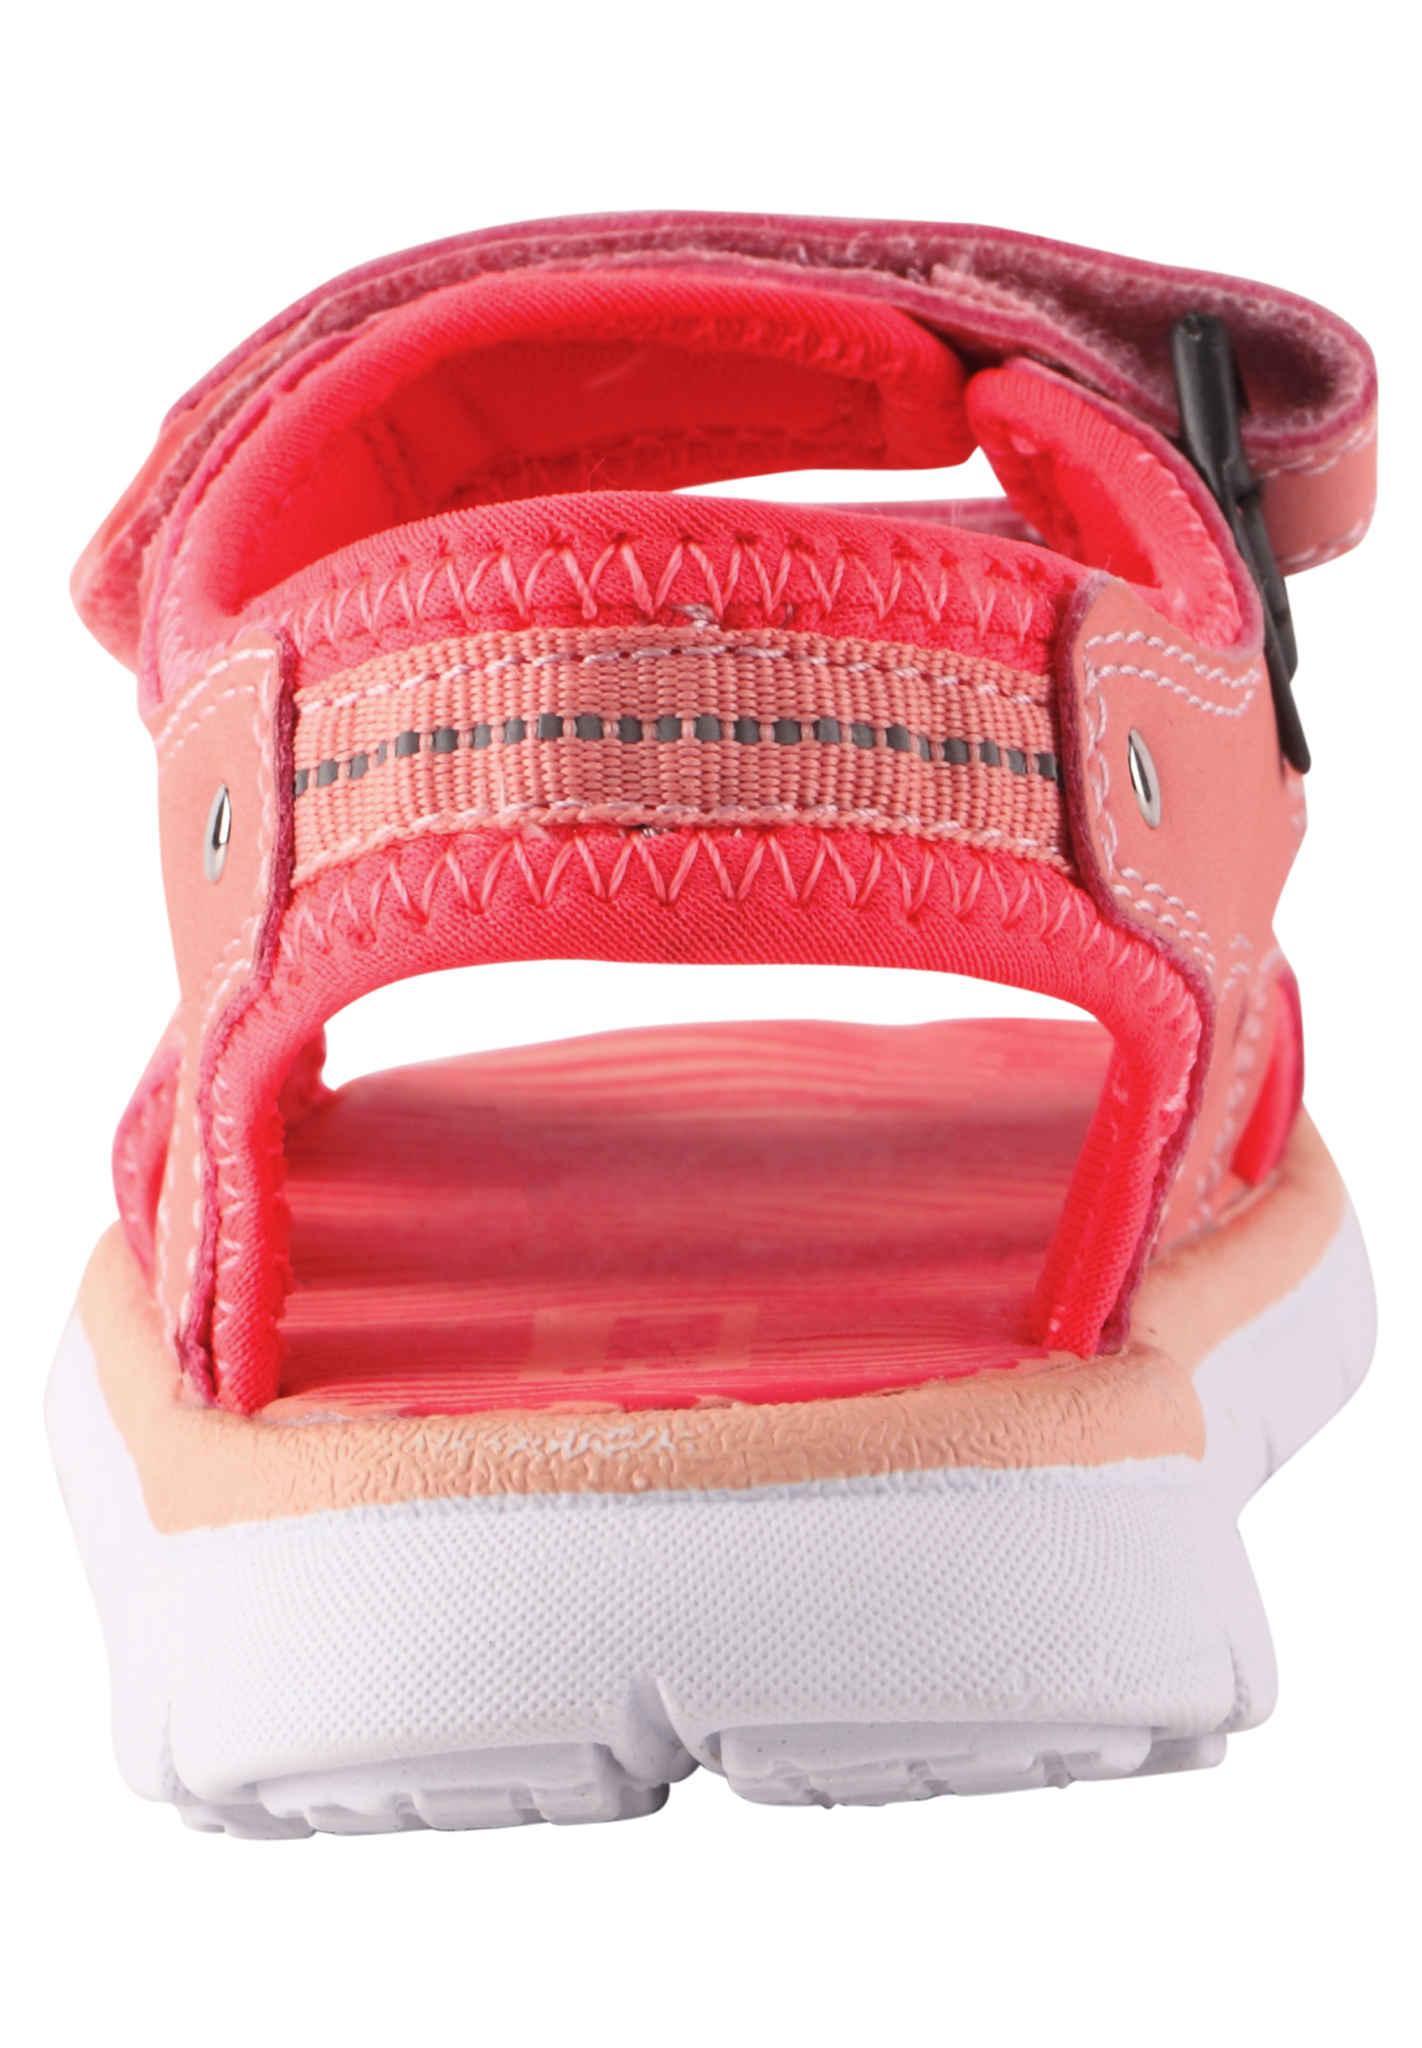 Reima Bungee Sandal Corall